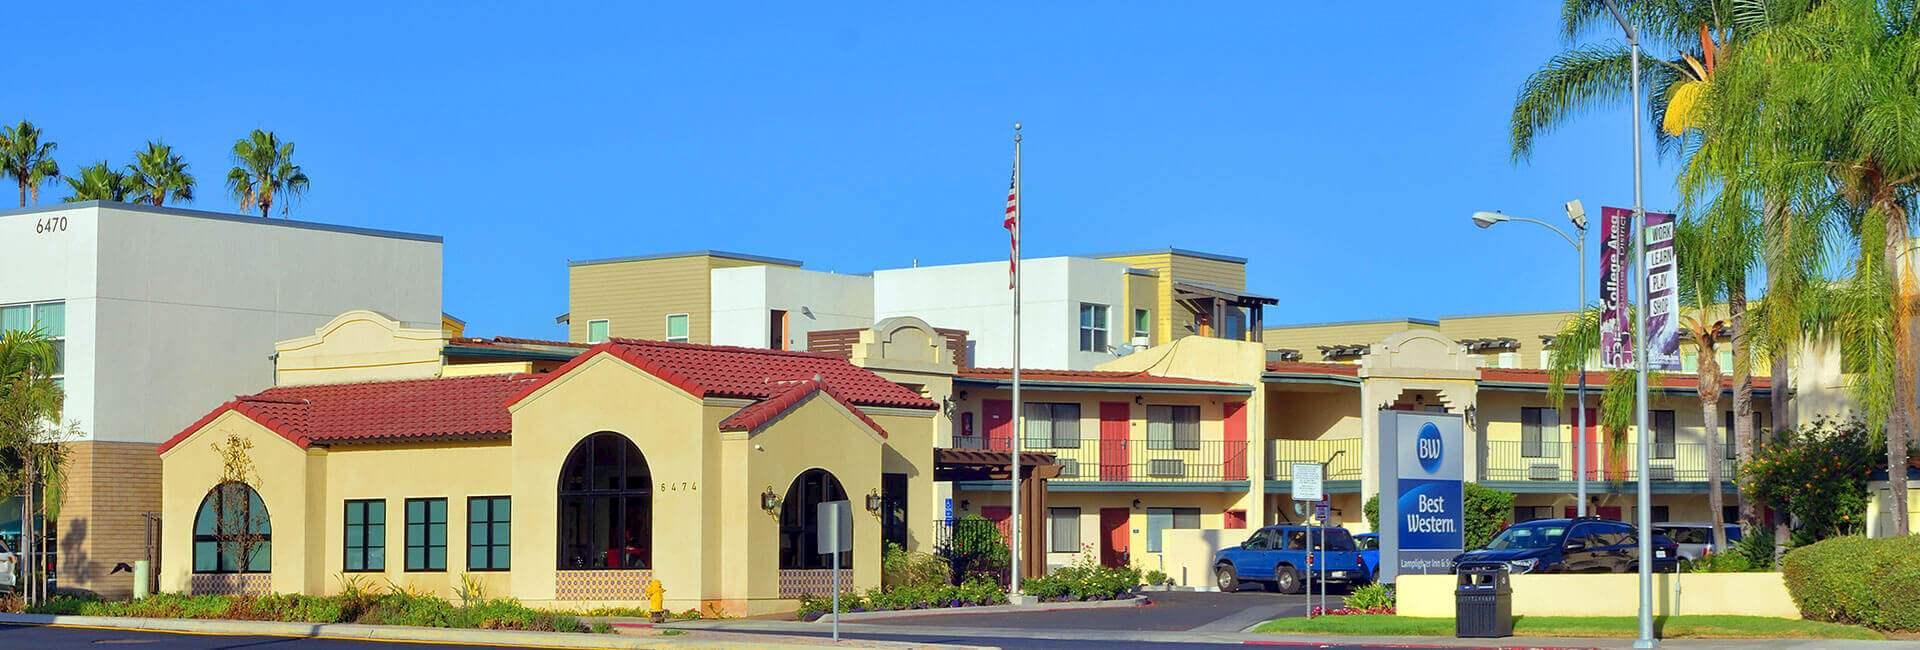 Site Map Lamplighter Inn & Suites at SDSU California